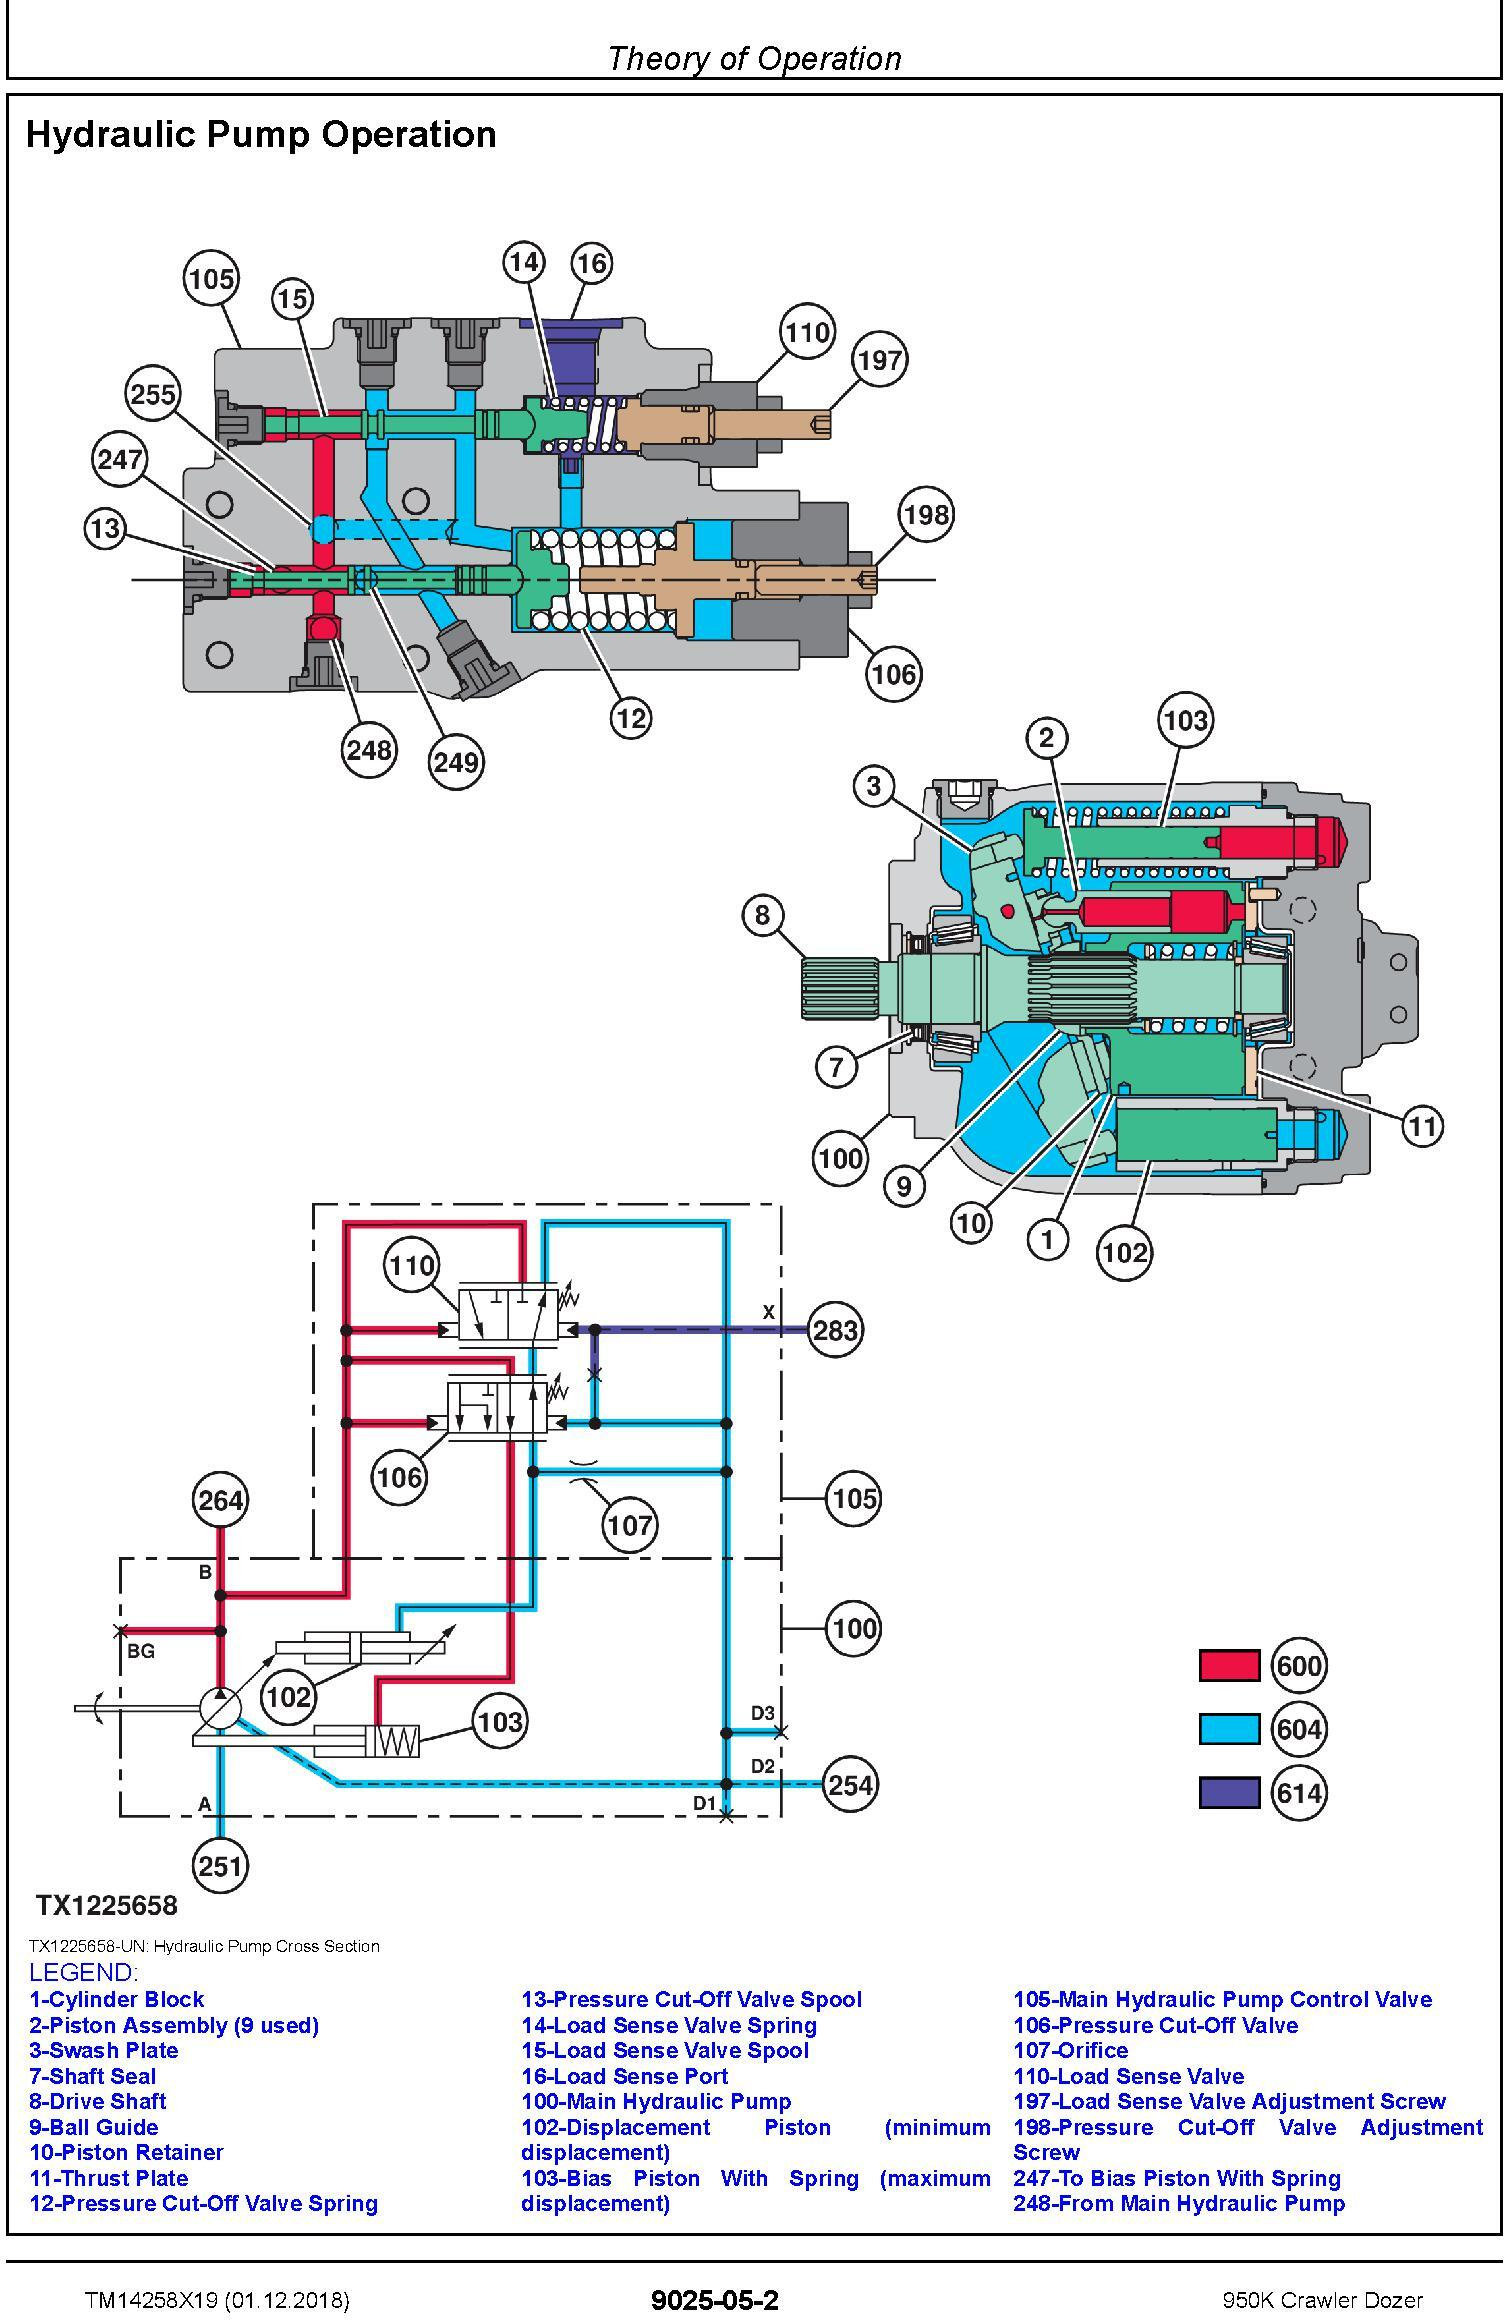 John Deere 950K (SN. C310401-338999) Crawler Dozer Operation & Test Technical Manual (TM14258X19) - 3